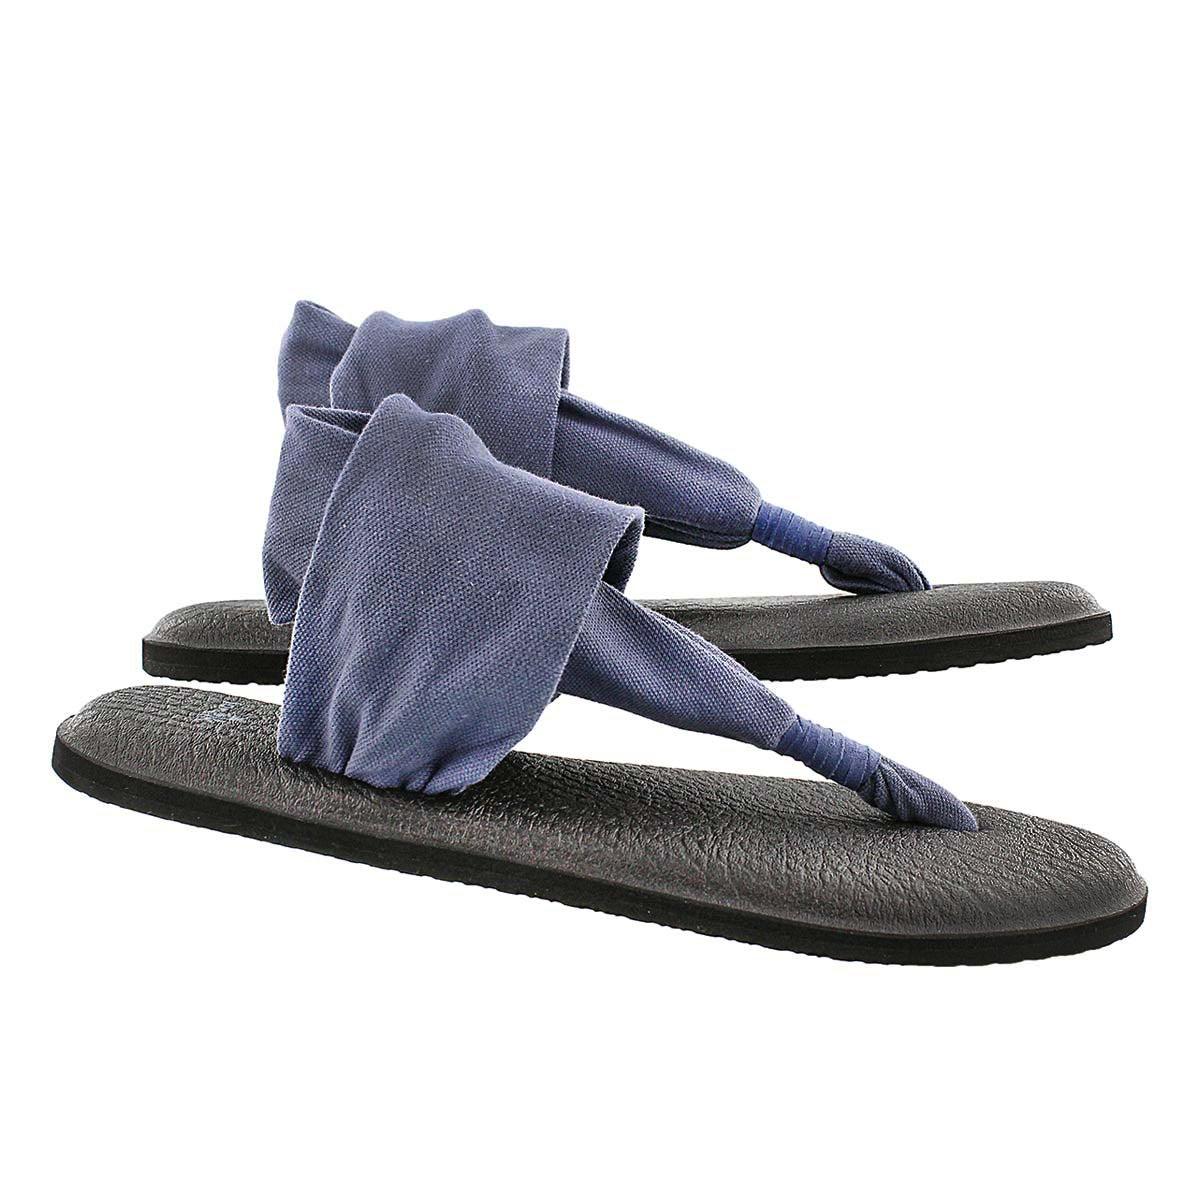 Sandale tong YogaSling bleu ardoise, fem